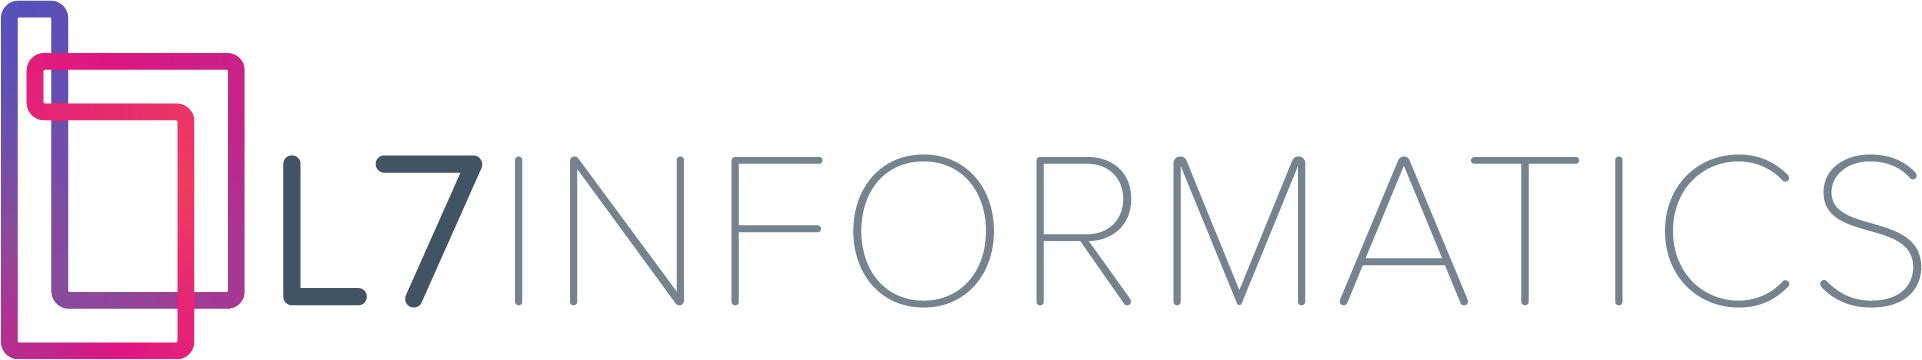 L7_logo_CORPORATE_RGB